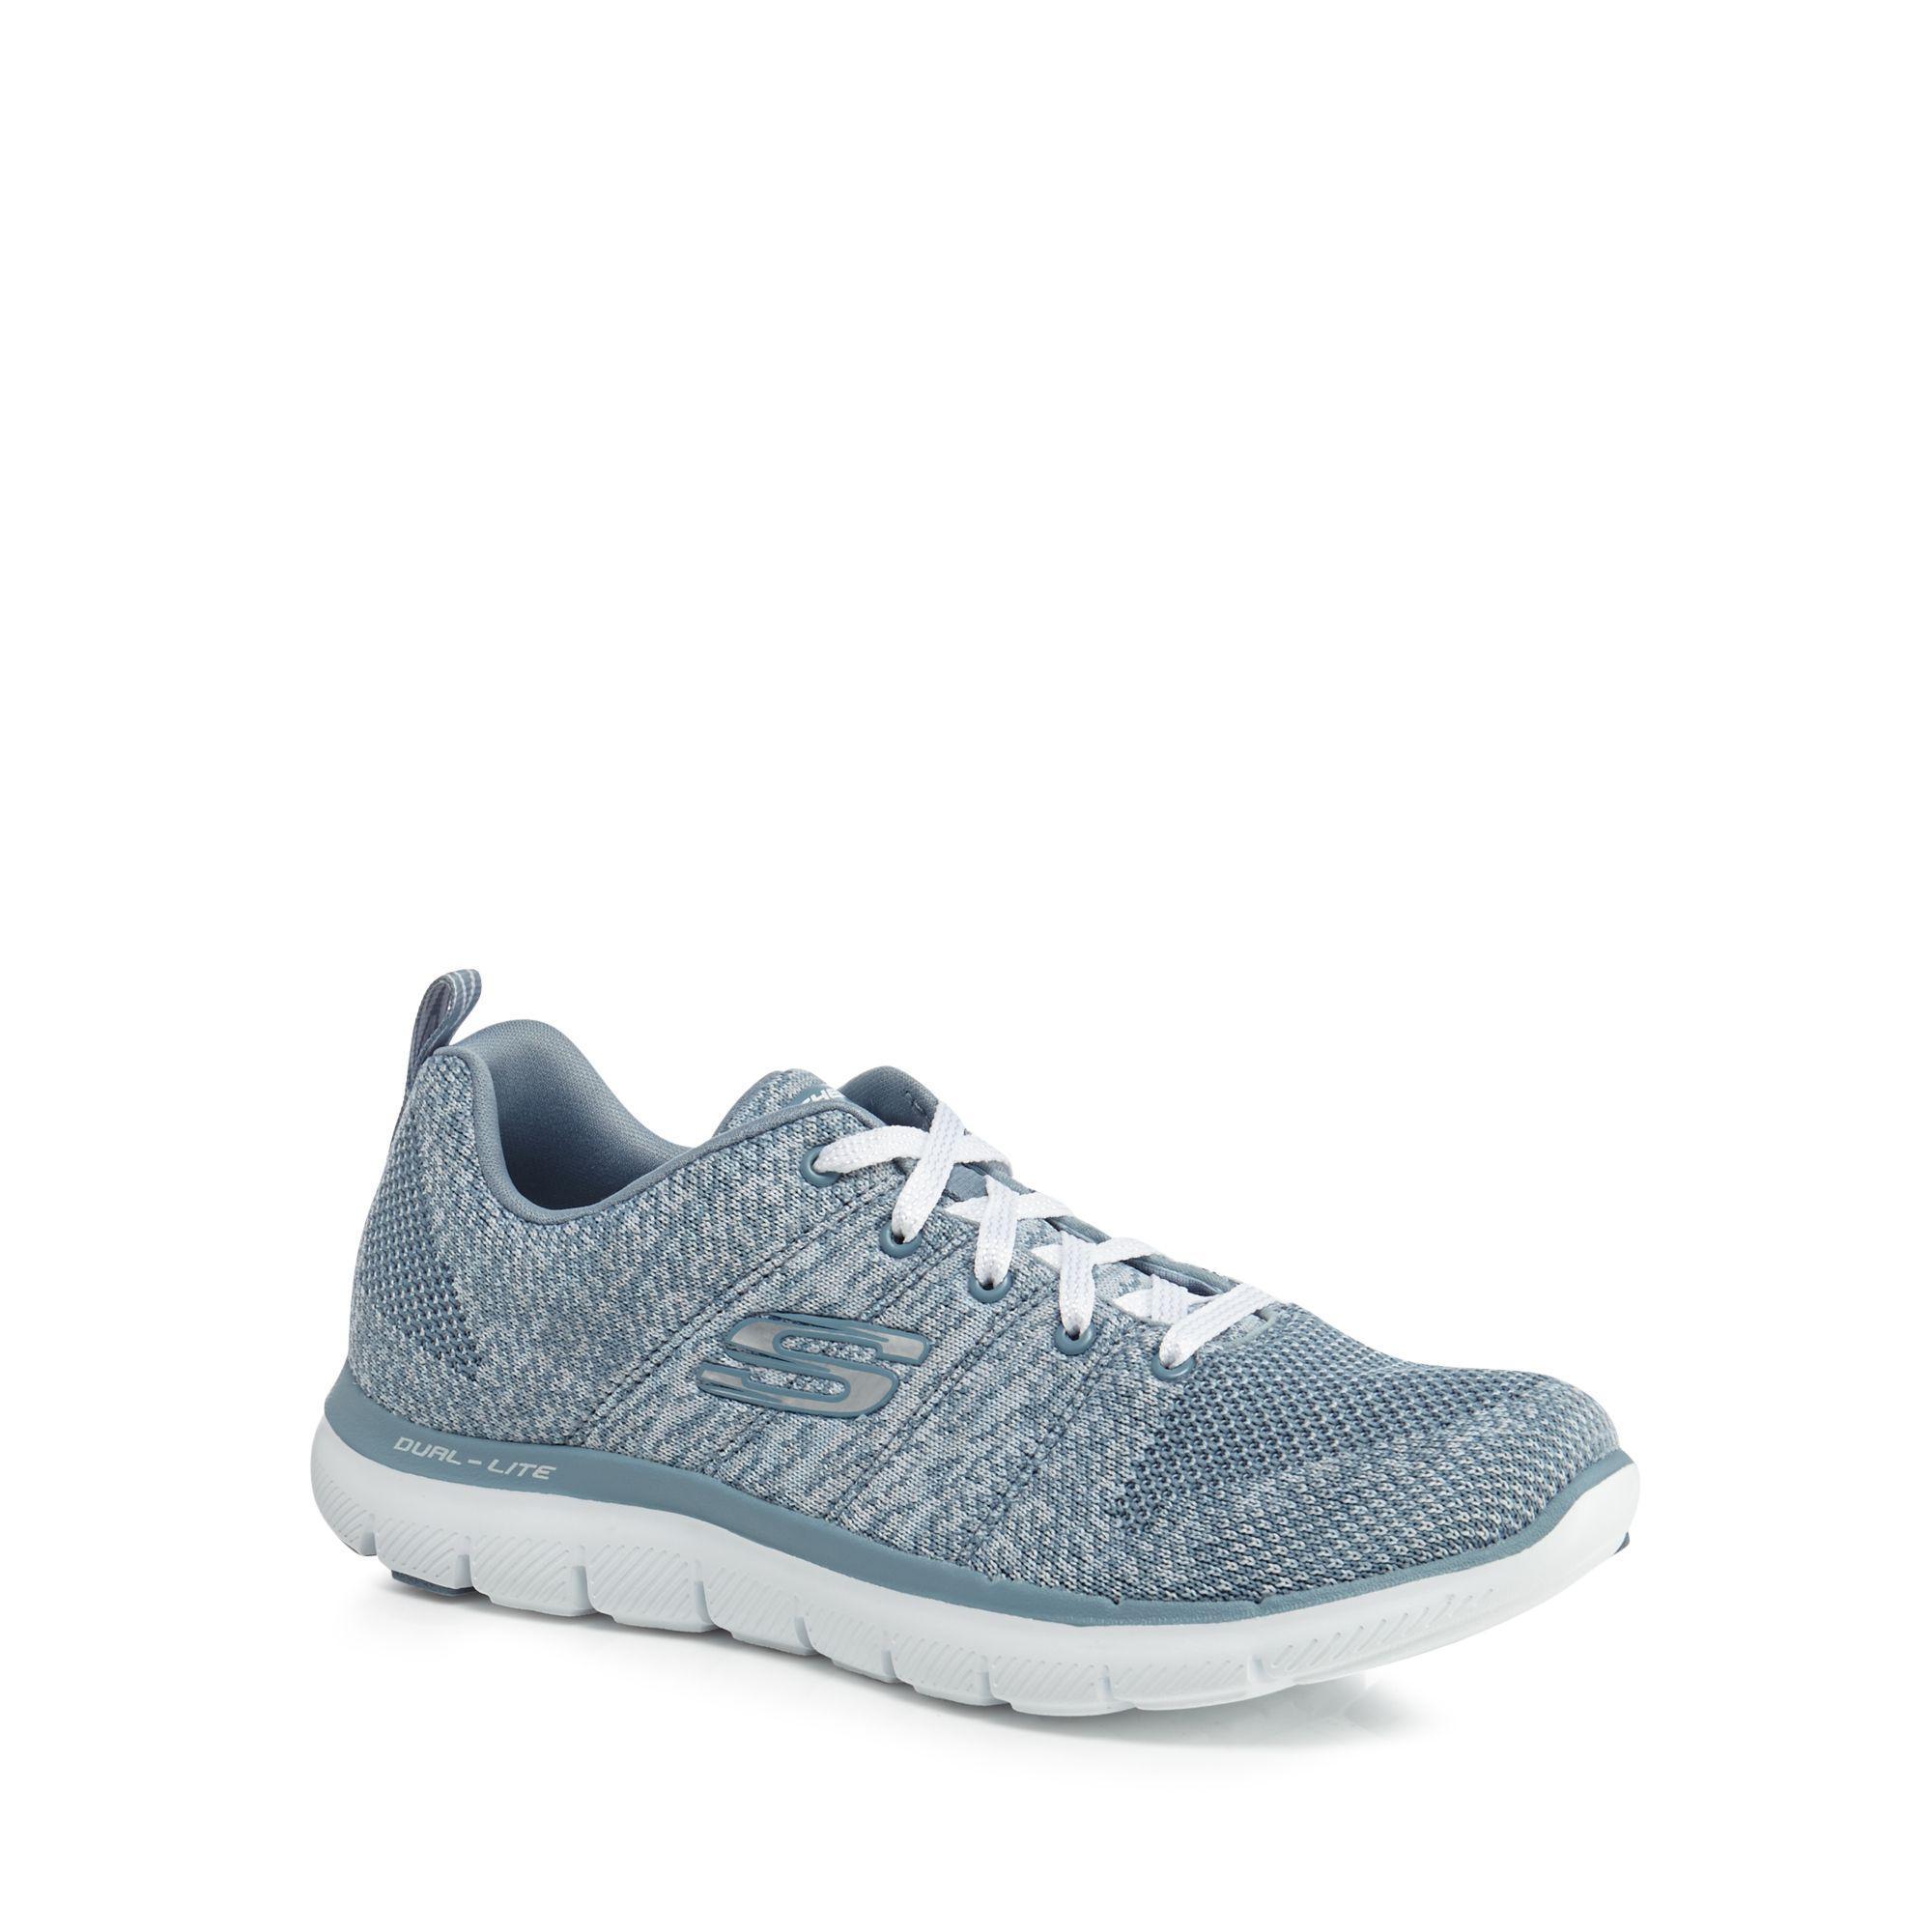 supply sale online find great sale online Blue knit 'Flex Appeal 2.0 High Energy' trainers cheap genuine best 1FZz82U1AX